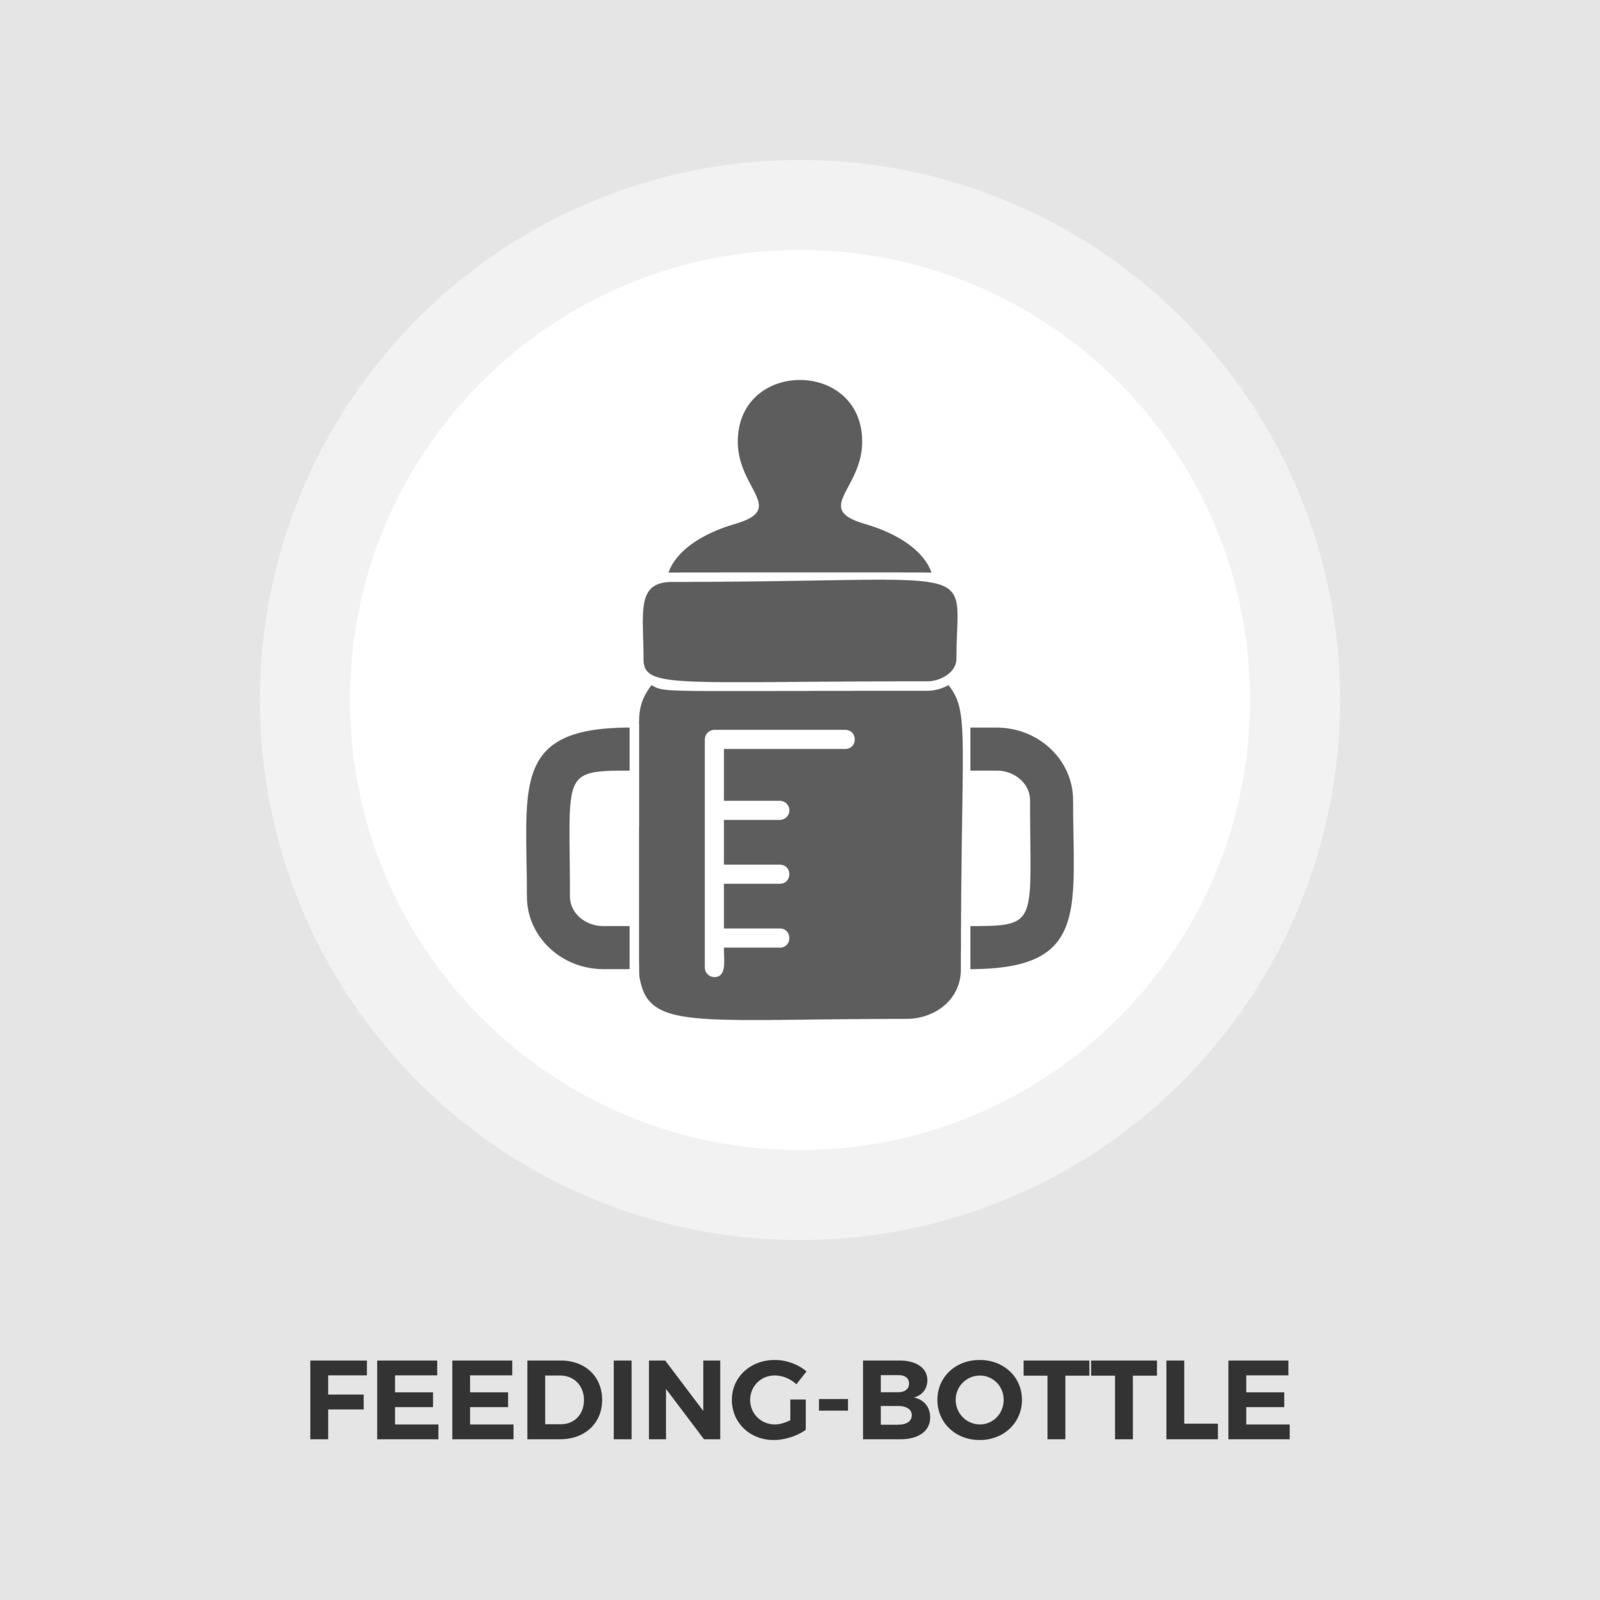 Feeding bottle vector flat icon by smoki